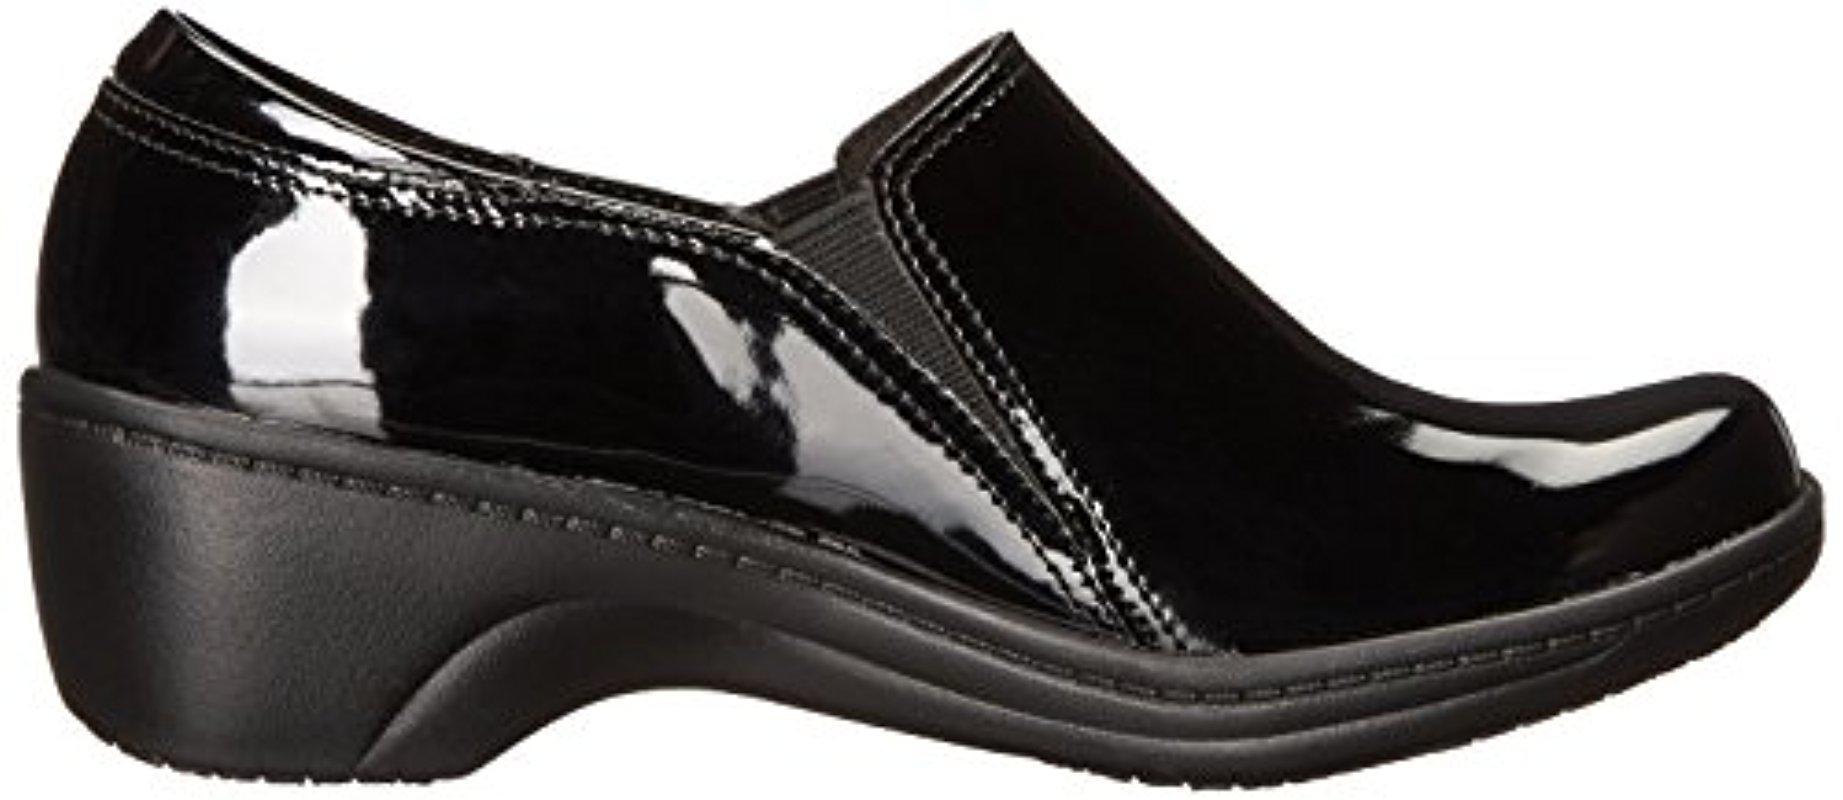 Clarks Leather Grasp Chime Slip-on